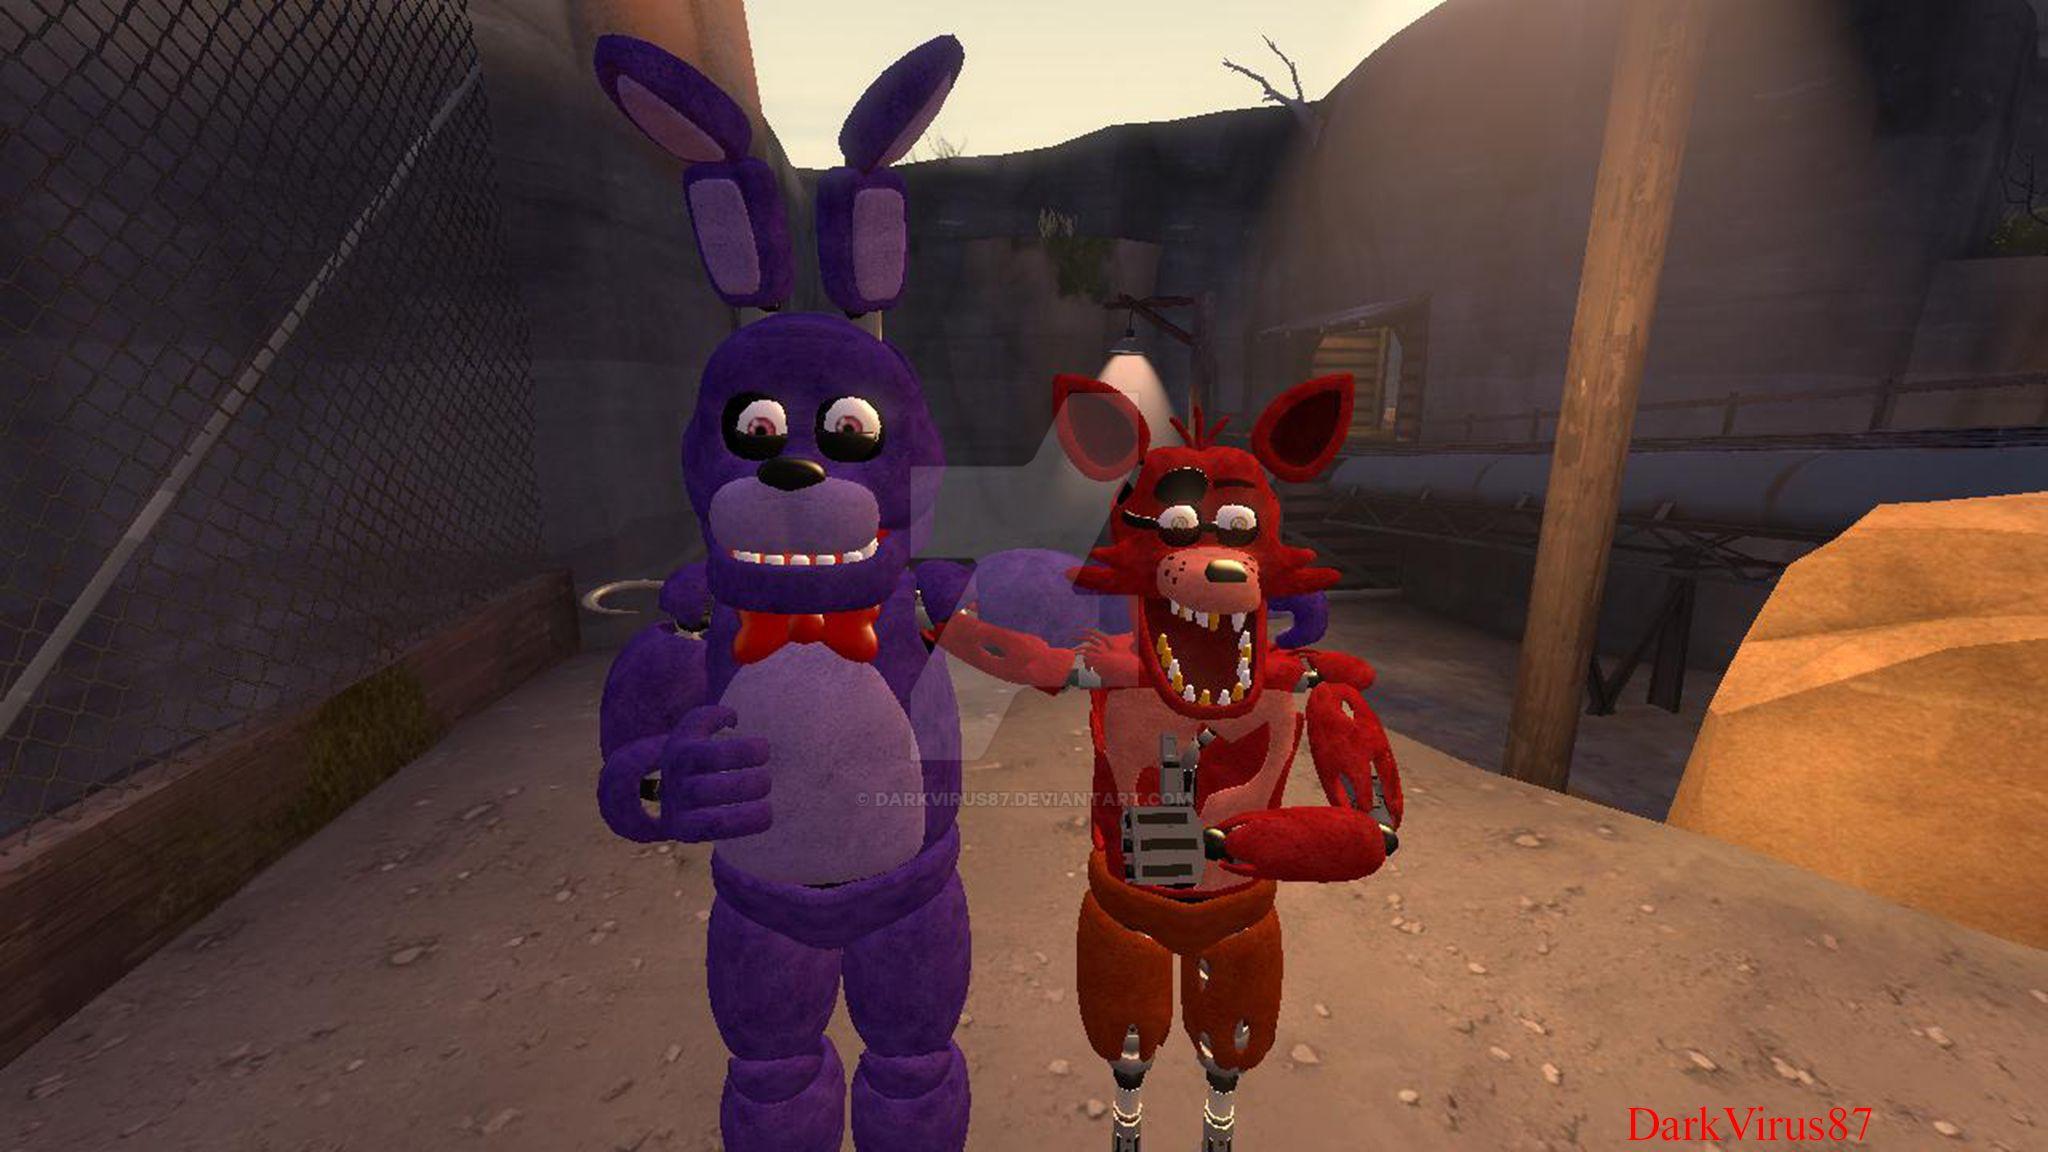 Foxy and Bonnie SFM by DarkVirus87